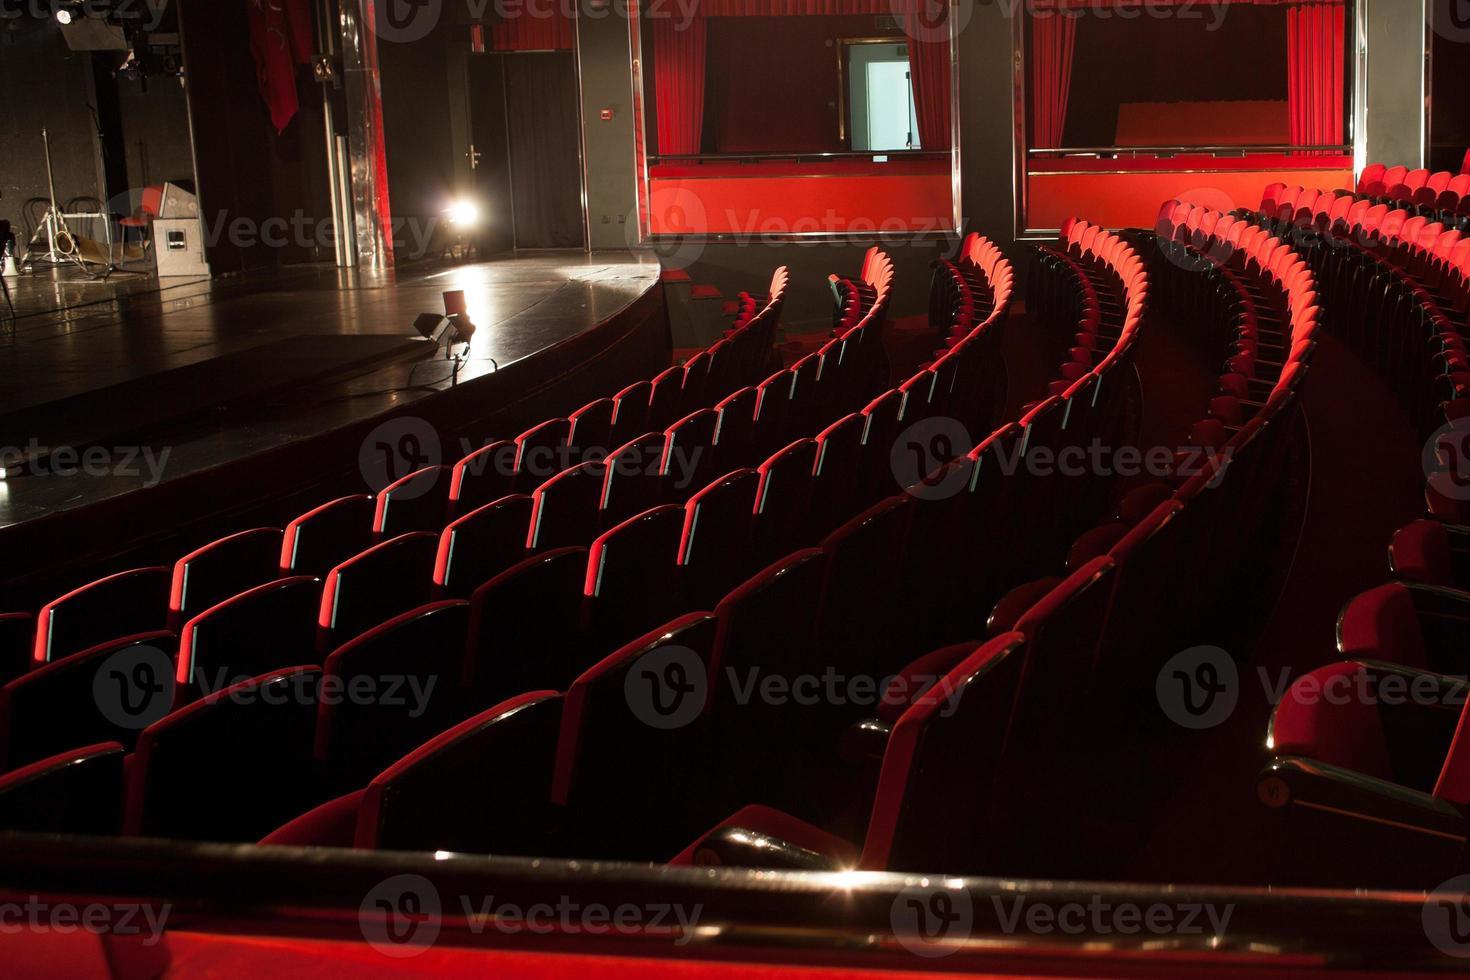 rode theaterstoelen foto